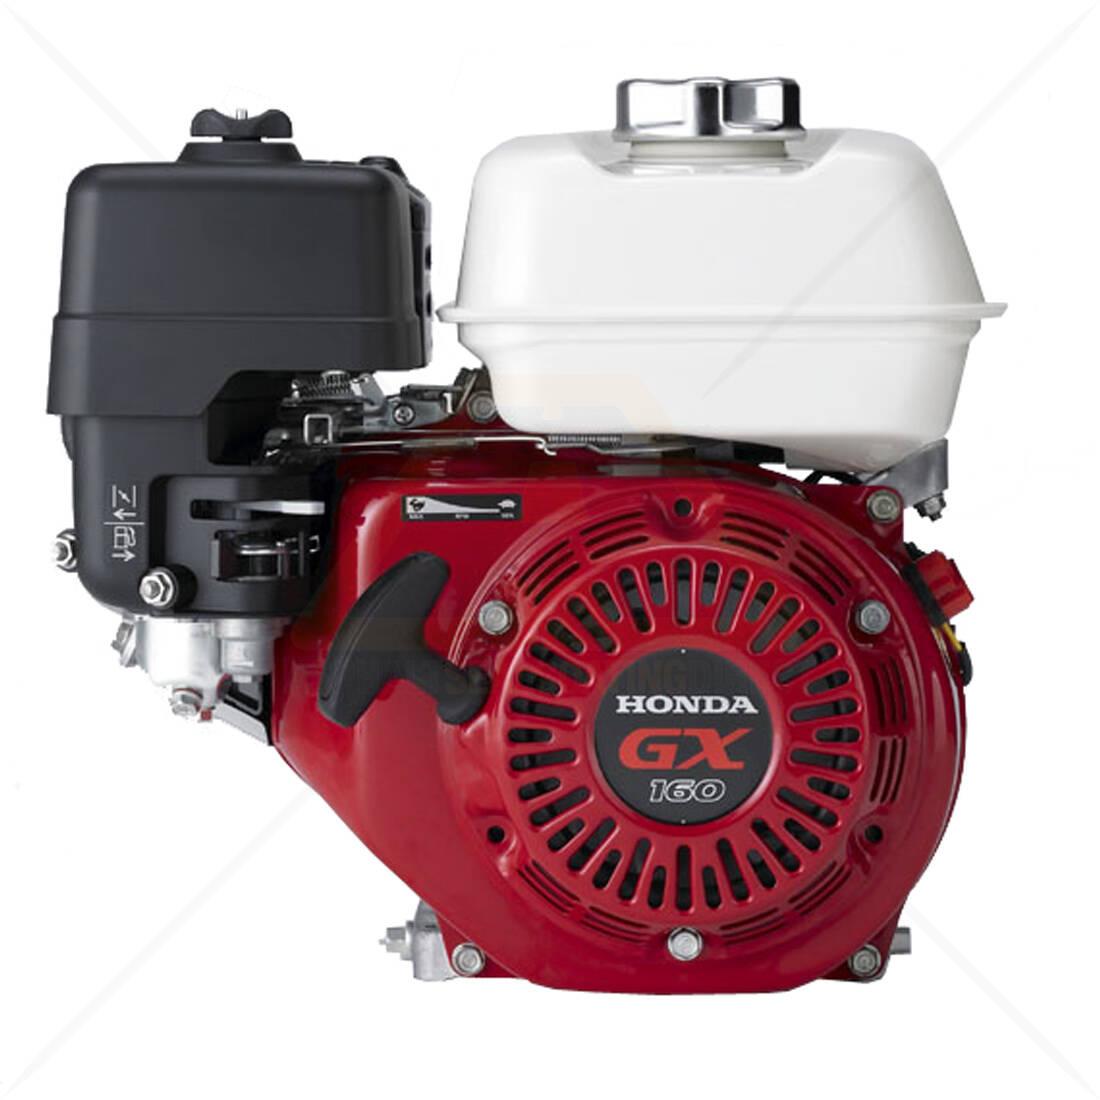 honda gx160 5 5 hp industrial engine for sale asphalt sealcoating rh asphaltsealcoatingdirect com Repair Manuals Yale Forklift Downloadable Online Chevrolet Repair Manuals